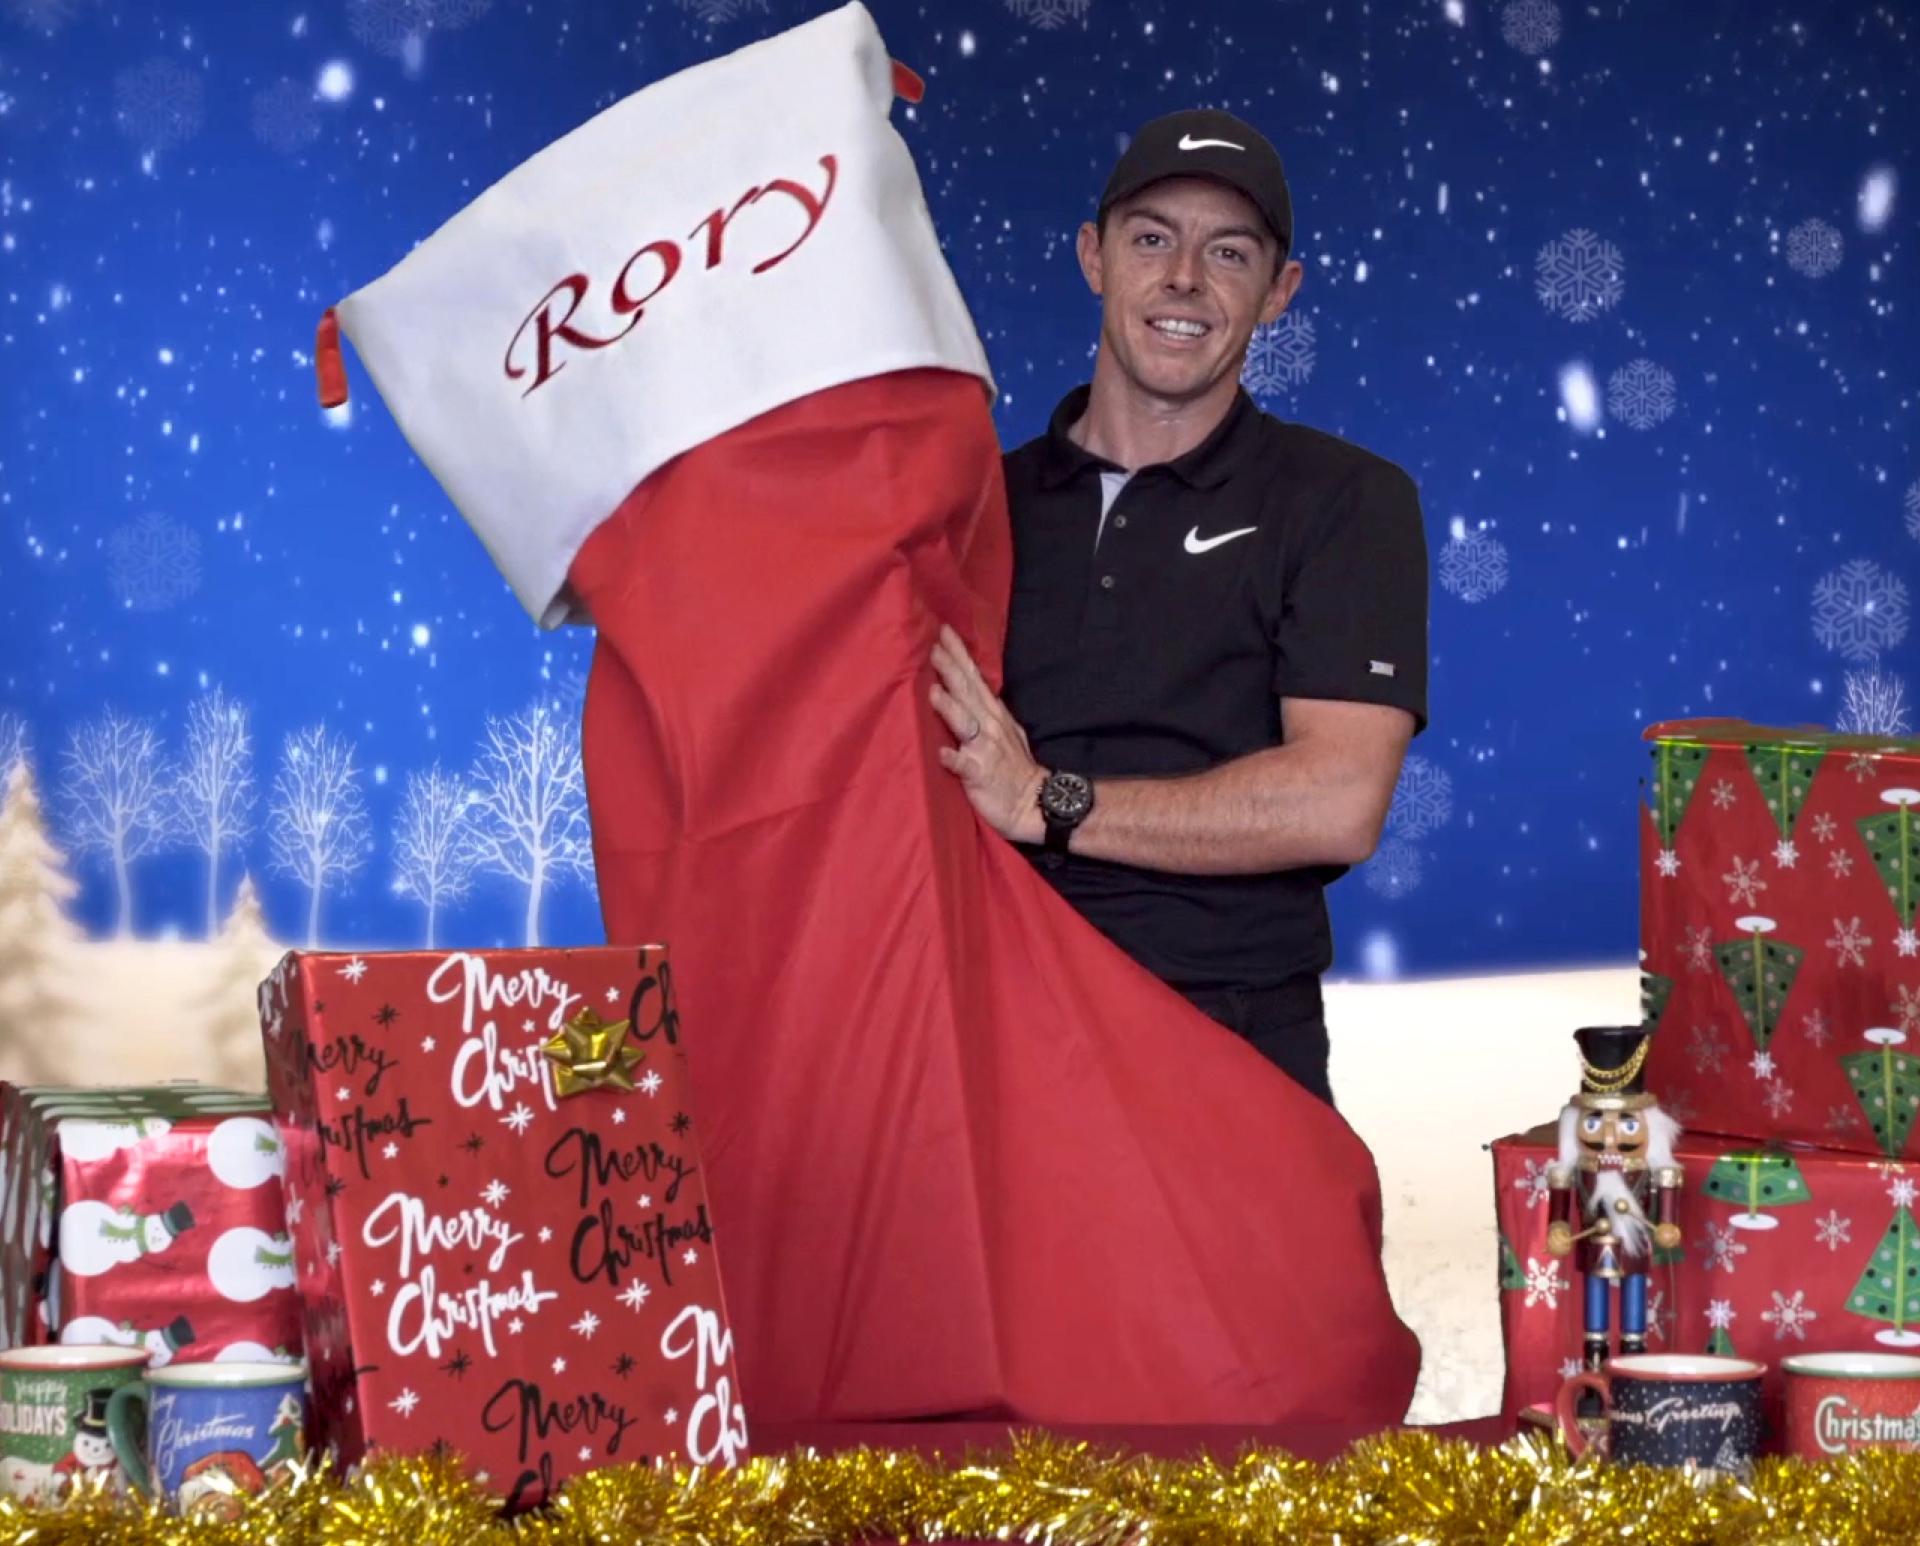 Rory McIlroy holiday stocking